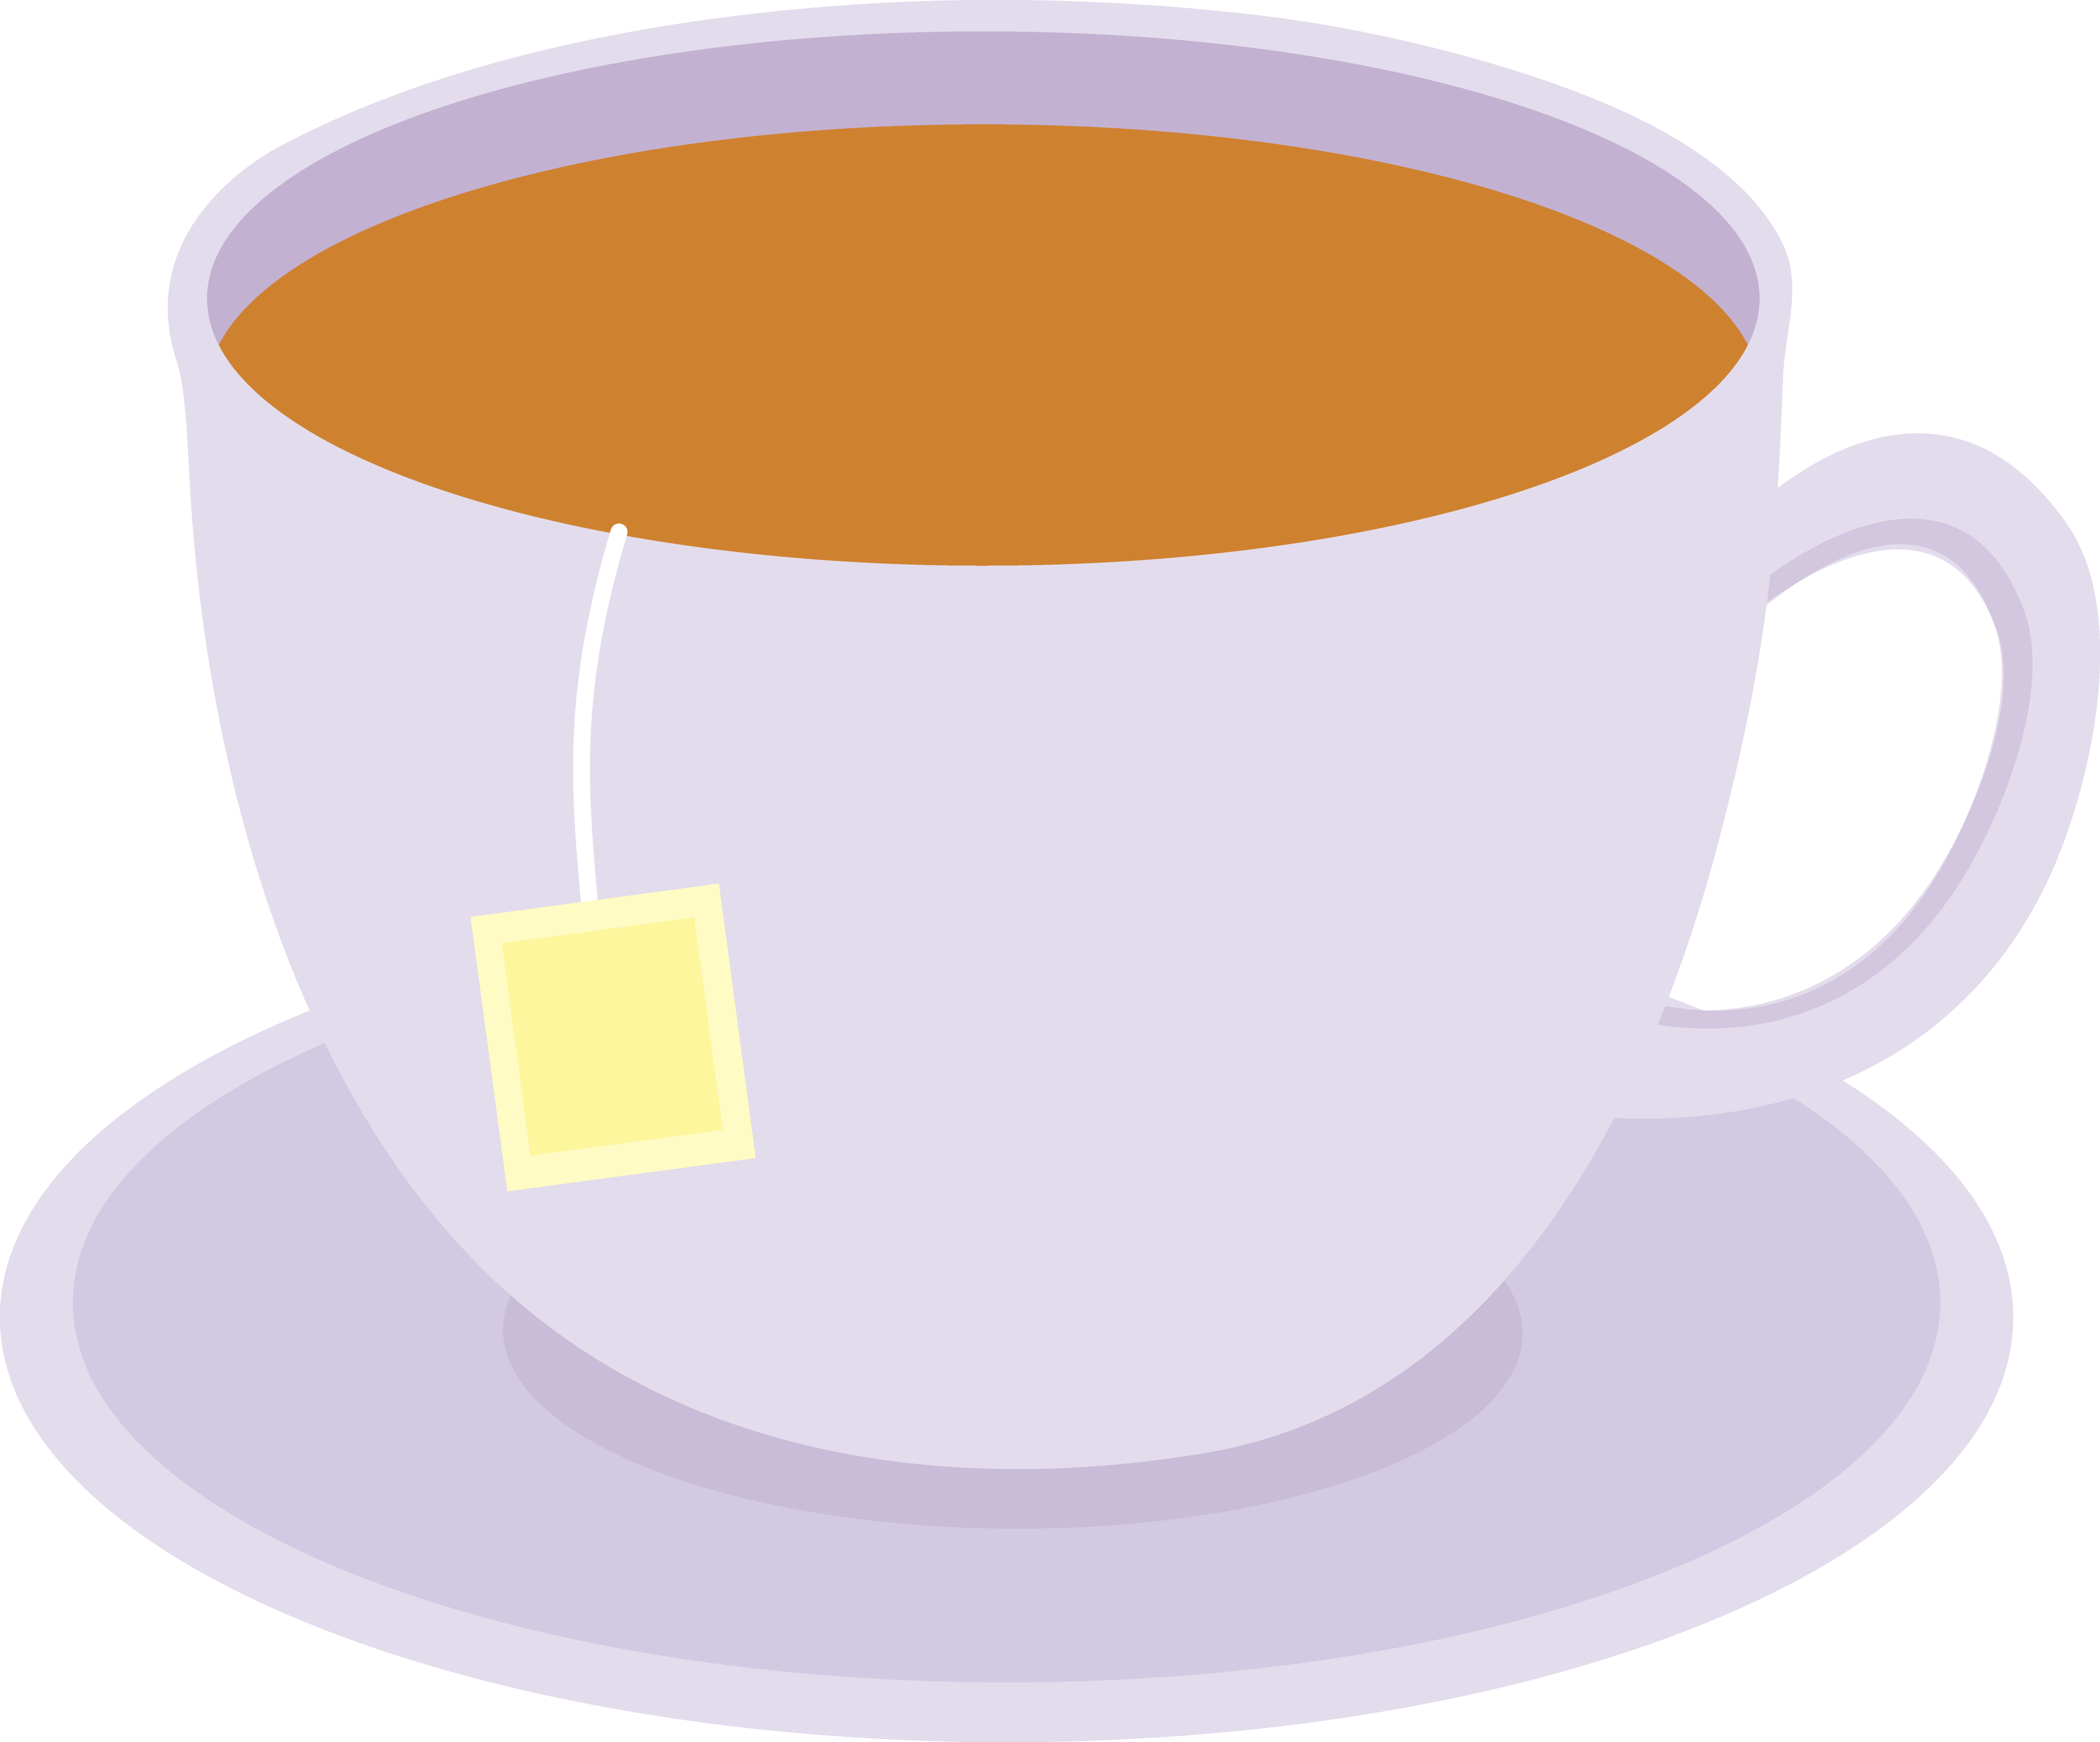 Mug clipart cup plate Dish Teabag of Tea on